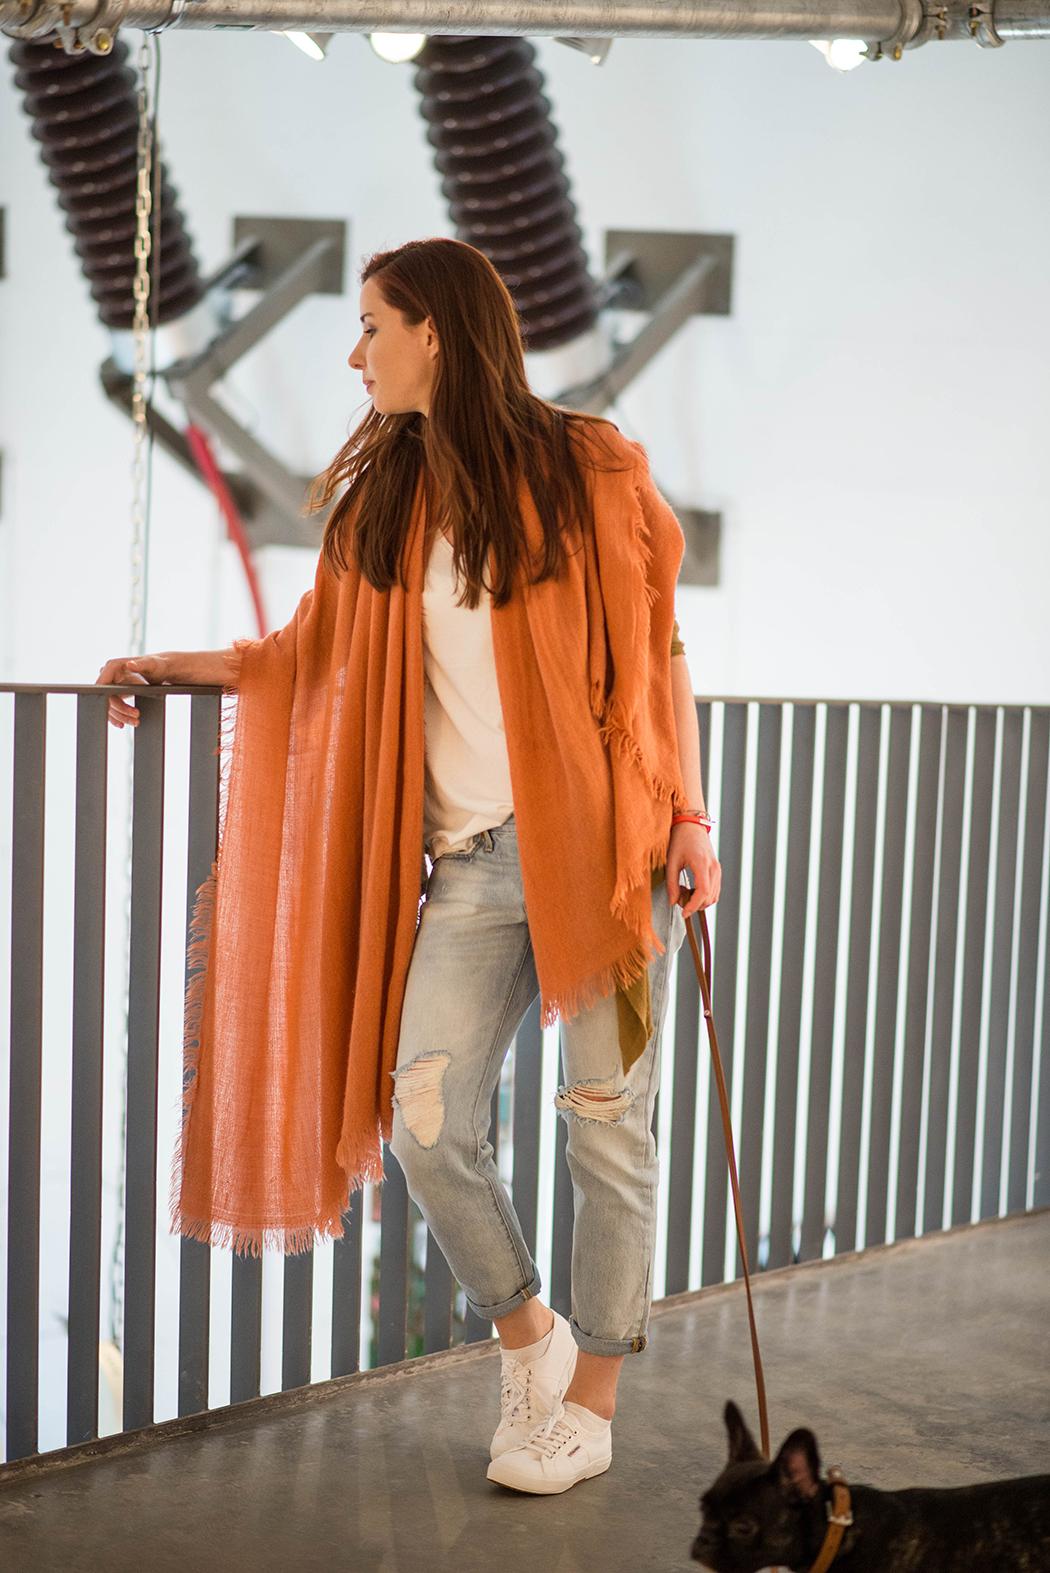 Jawbone-UP24-Produktbewertung-Testbericht-Schrittzähler-Fitnessarmband-Produktreview-Fashionblogger-Lindarella-München-Fashionblog-Fitnessblogger-Fitnessblog-26